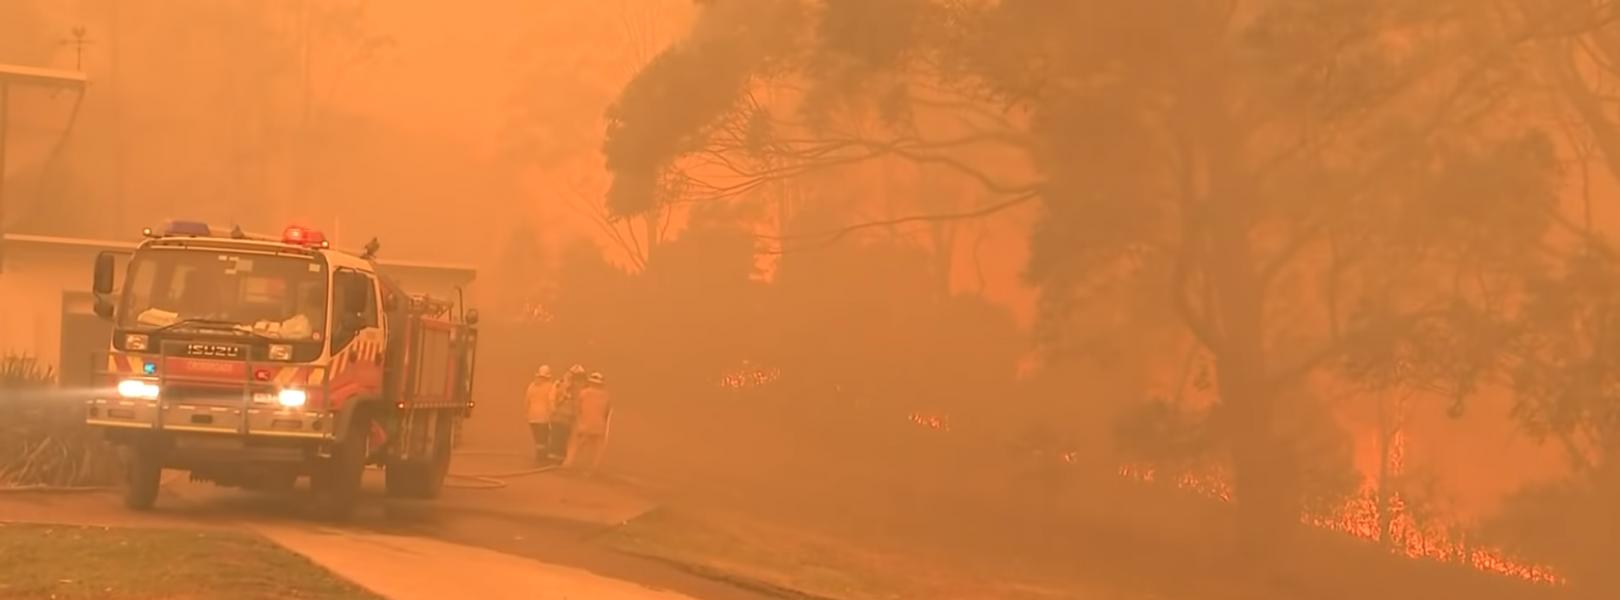 Amid raging bushfires, Rupert Murdoch's Australian media empire turns a blind eye to climate crisis